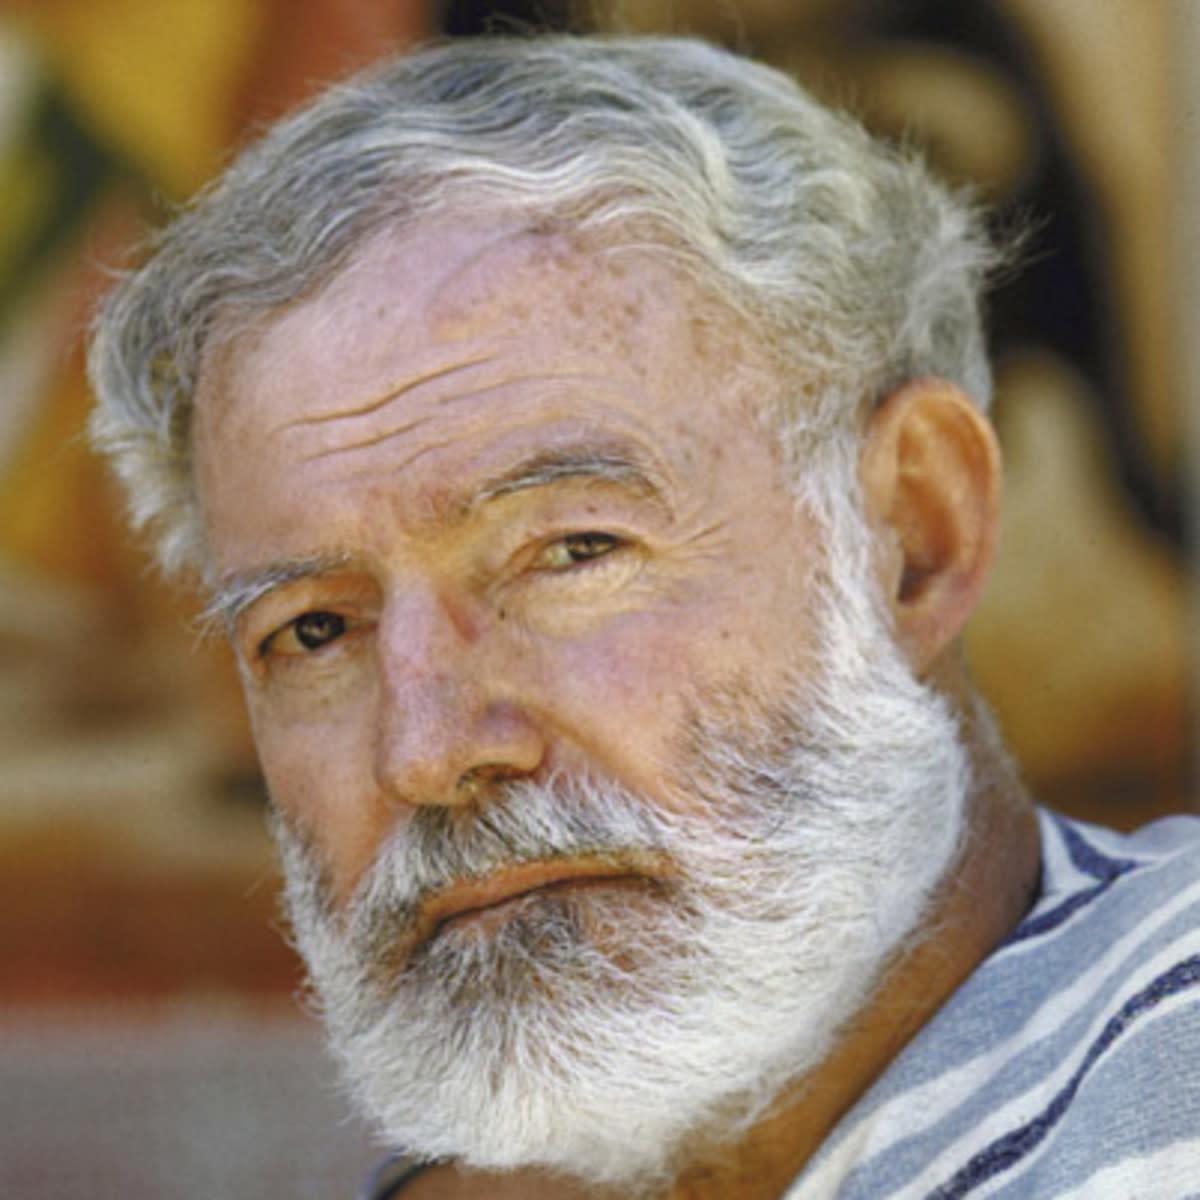 The Giant Thinker, Hemingway.